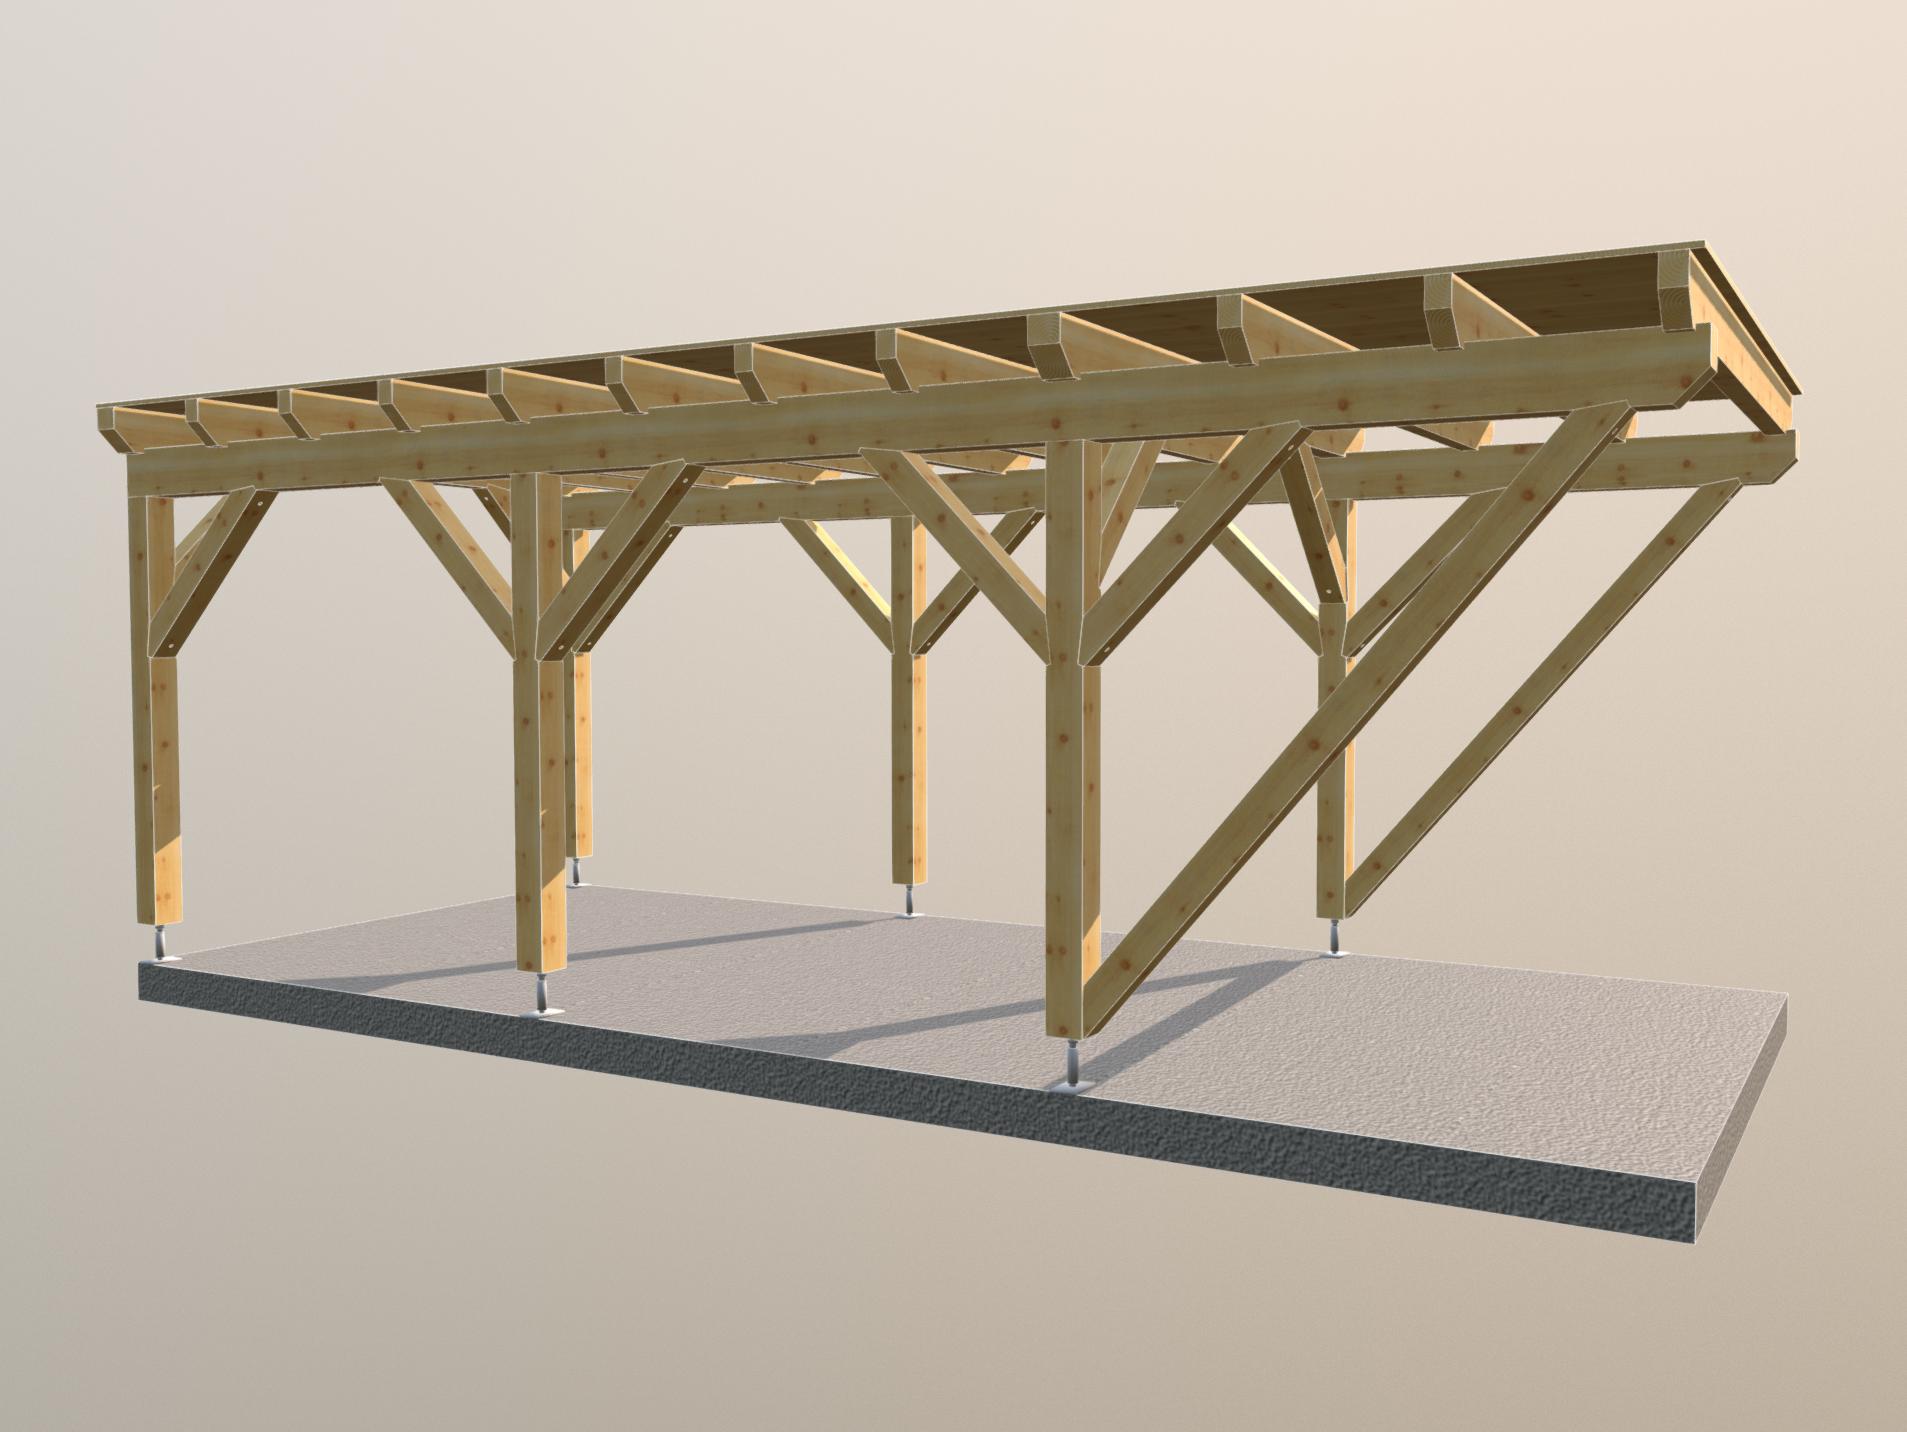 Holz carport 3m x7m flachdach, carports aus polen